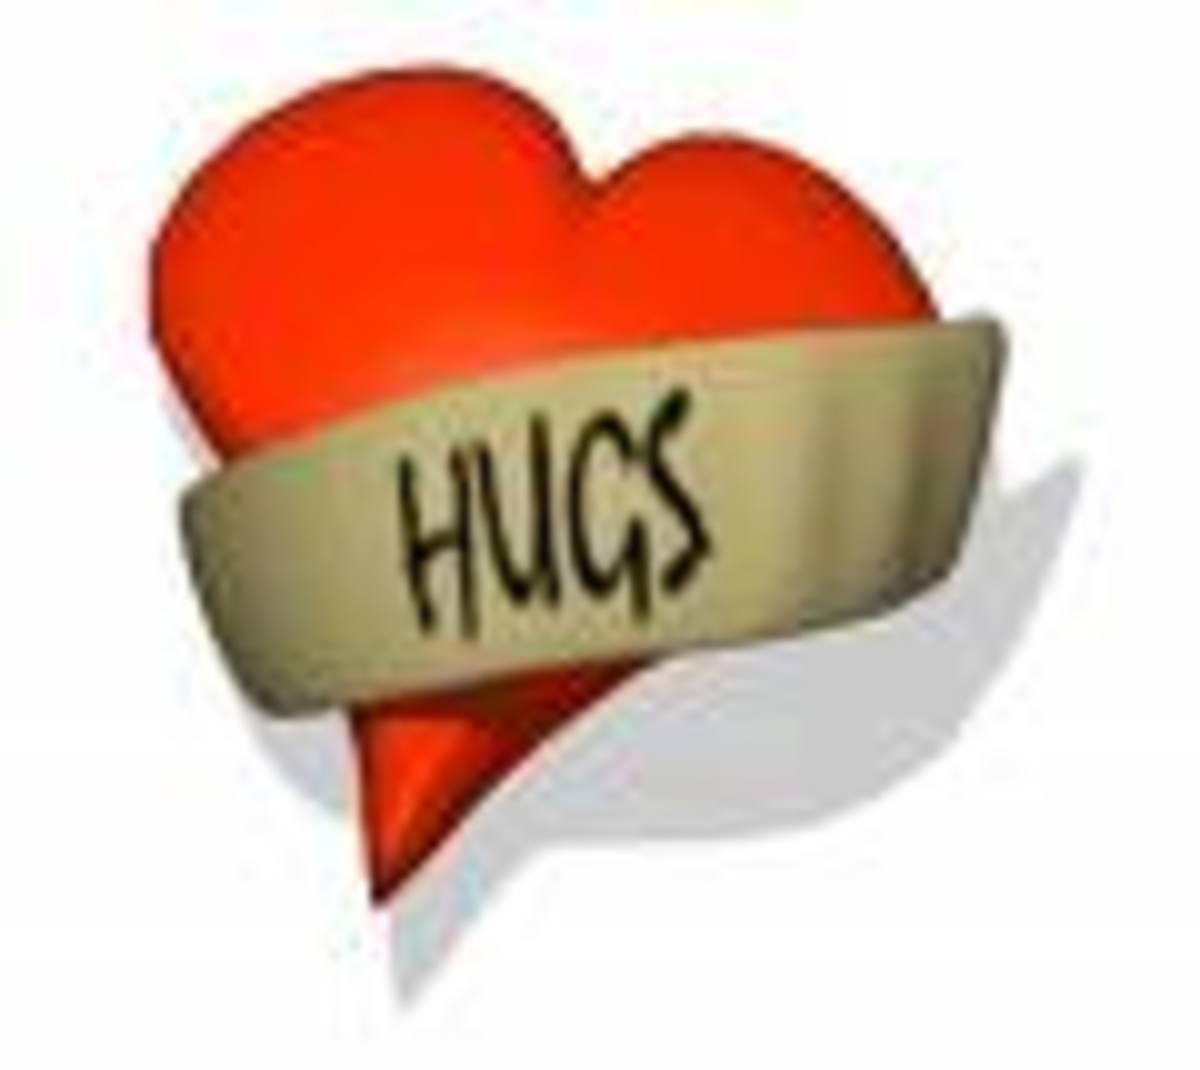 Hugs are Love